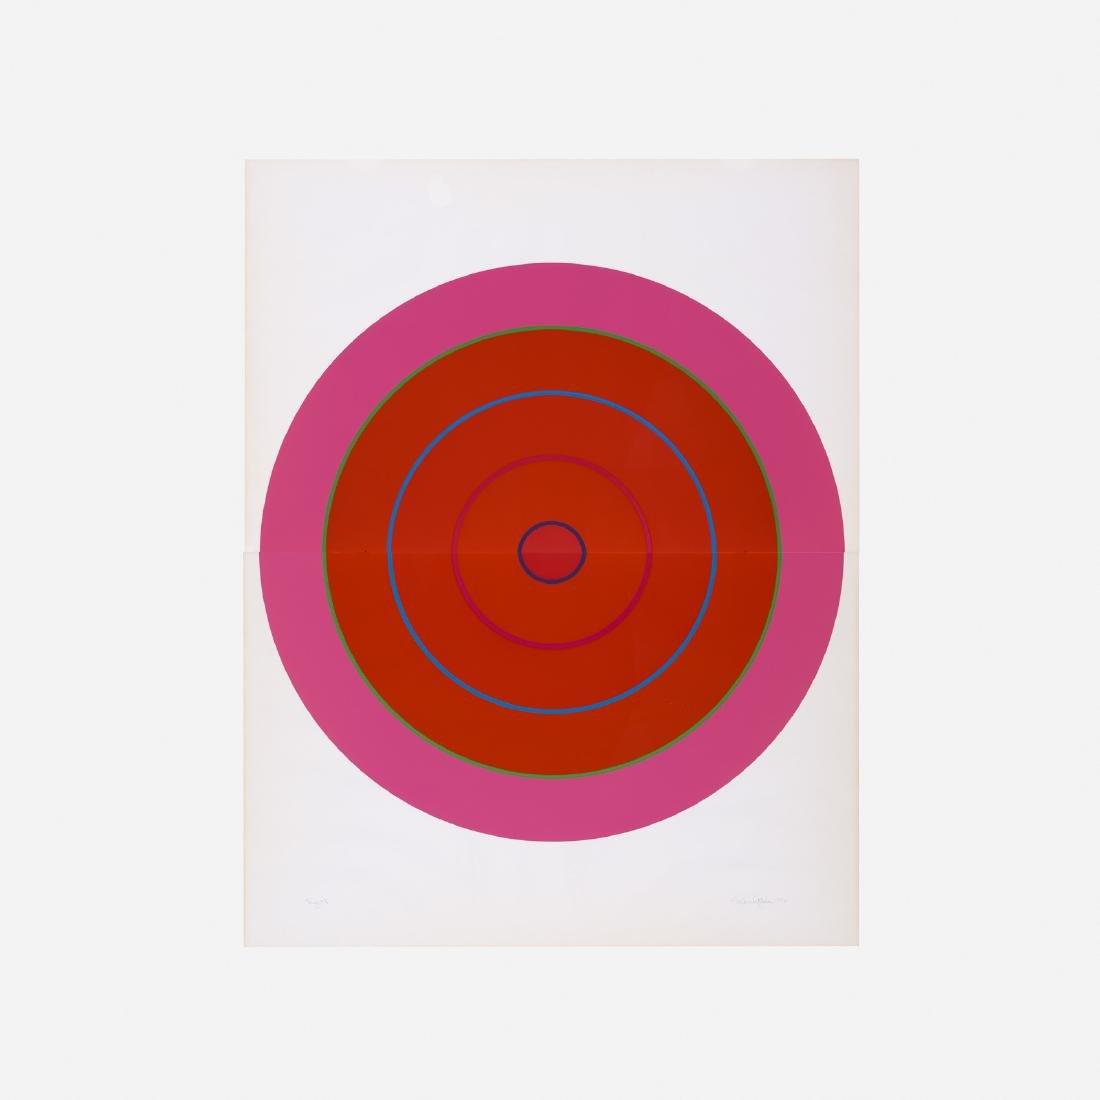 Stephen Frykholm, Target (diptych)